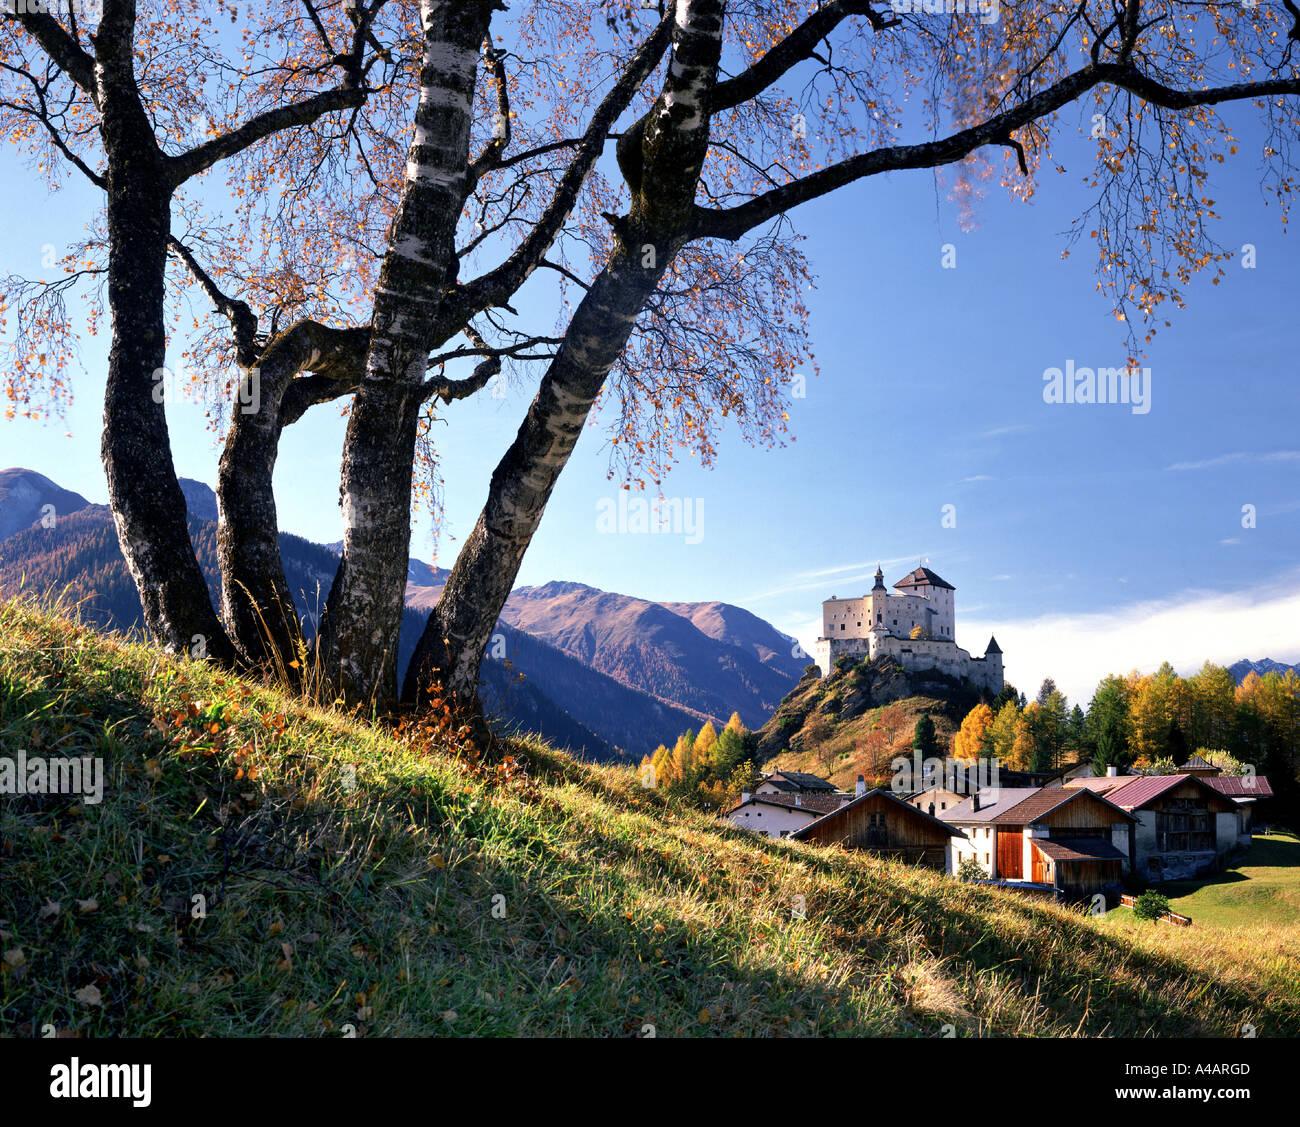 CH - LOWER ENGADIN:  Tarasp Castle - Stock Image